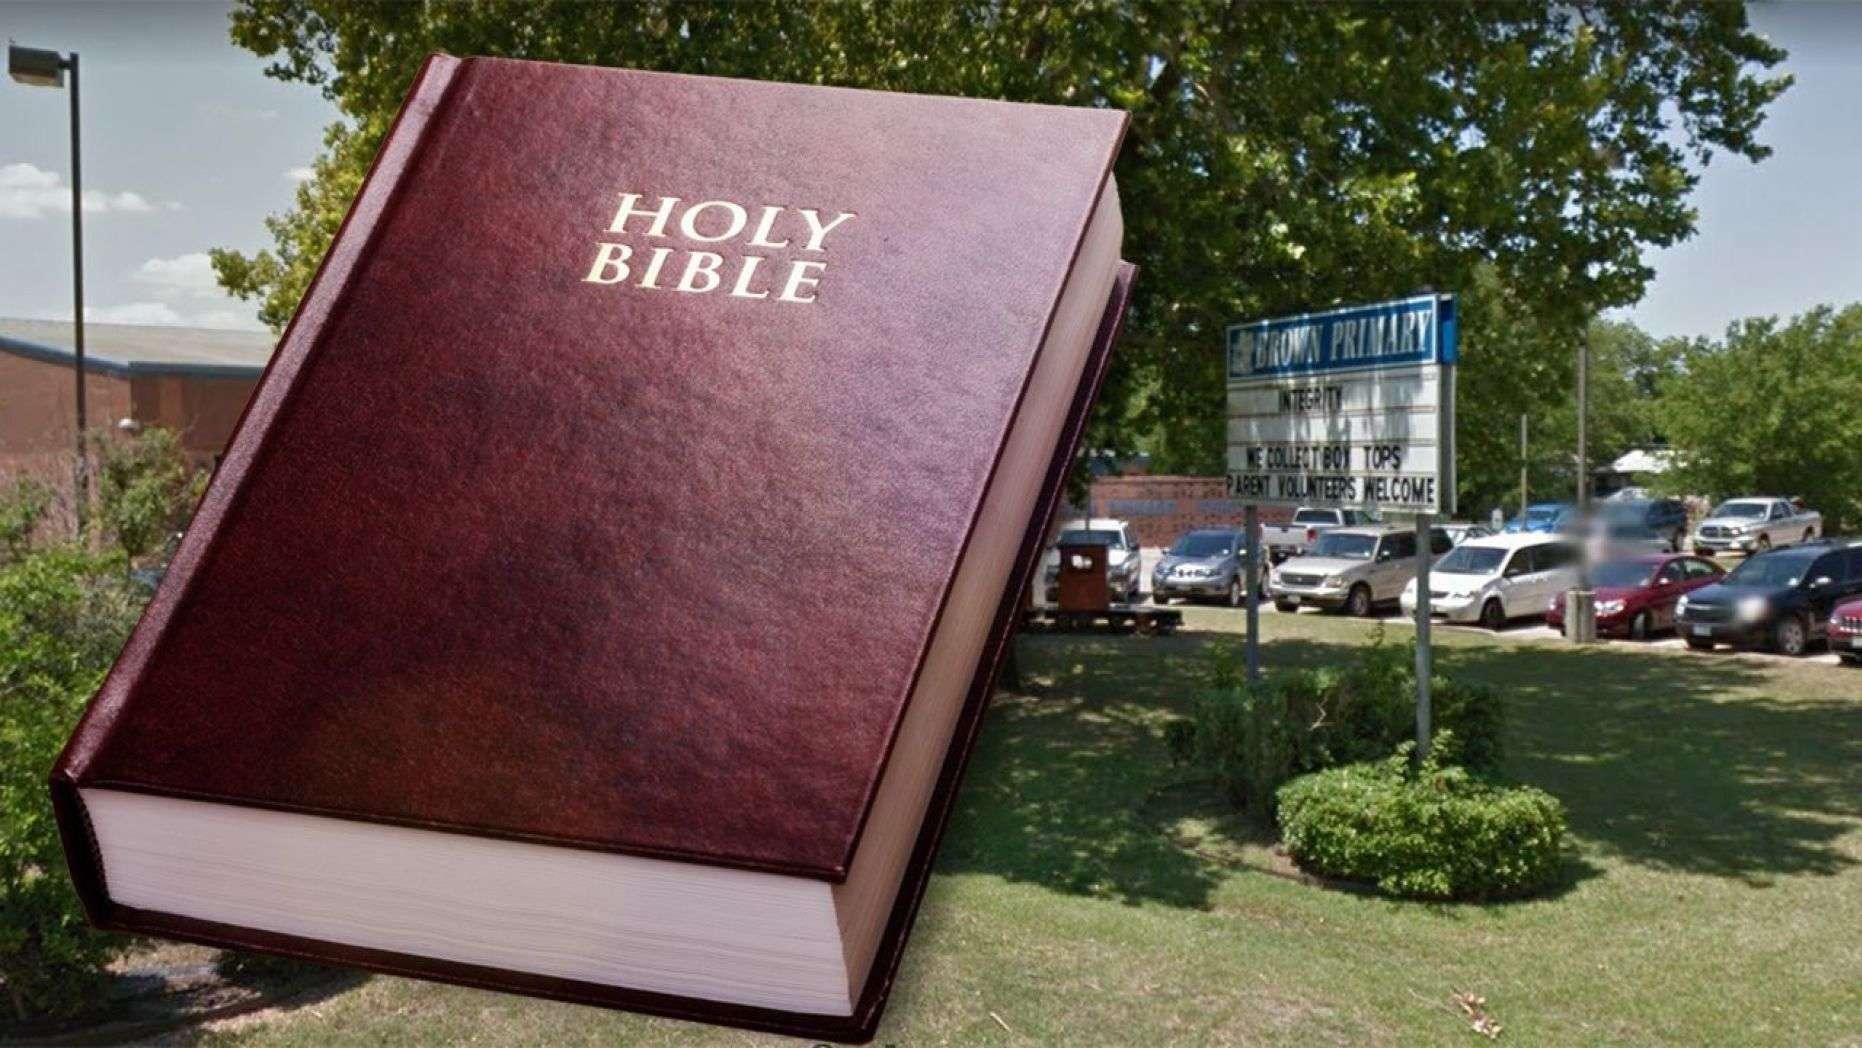 Susan Schobel, a first-grade teacher in Texas, received support for having kids in her classroom recite a Bible verse, although a few parents were upset. (iStock/Google Maps)